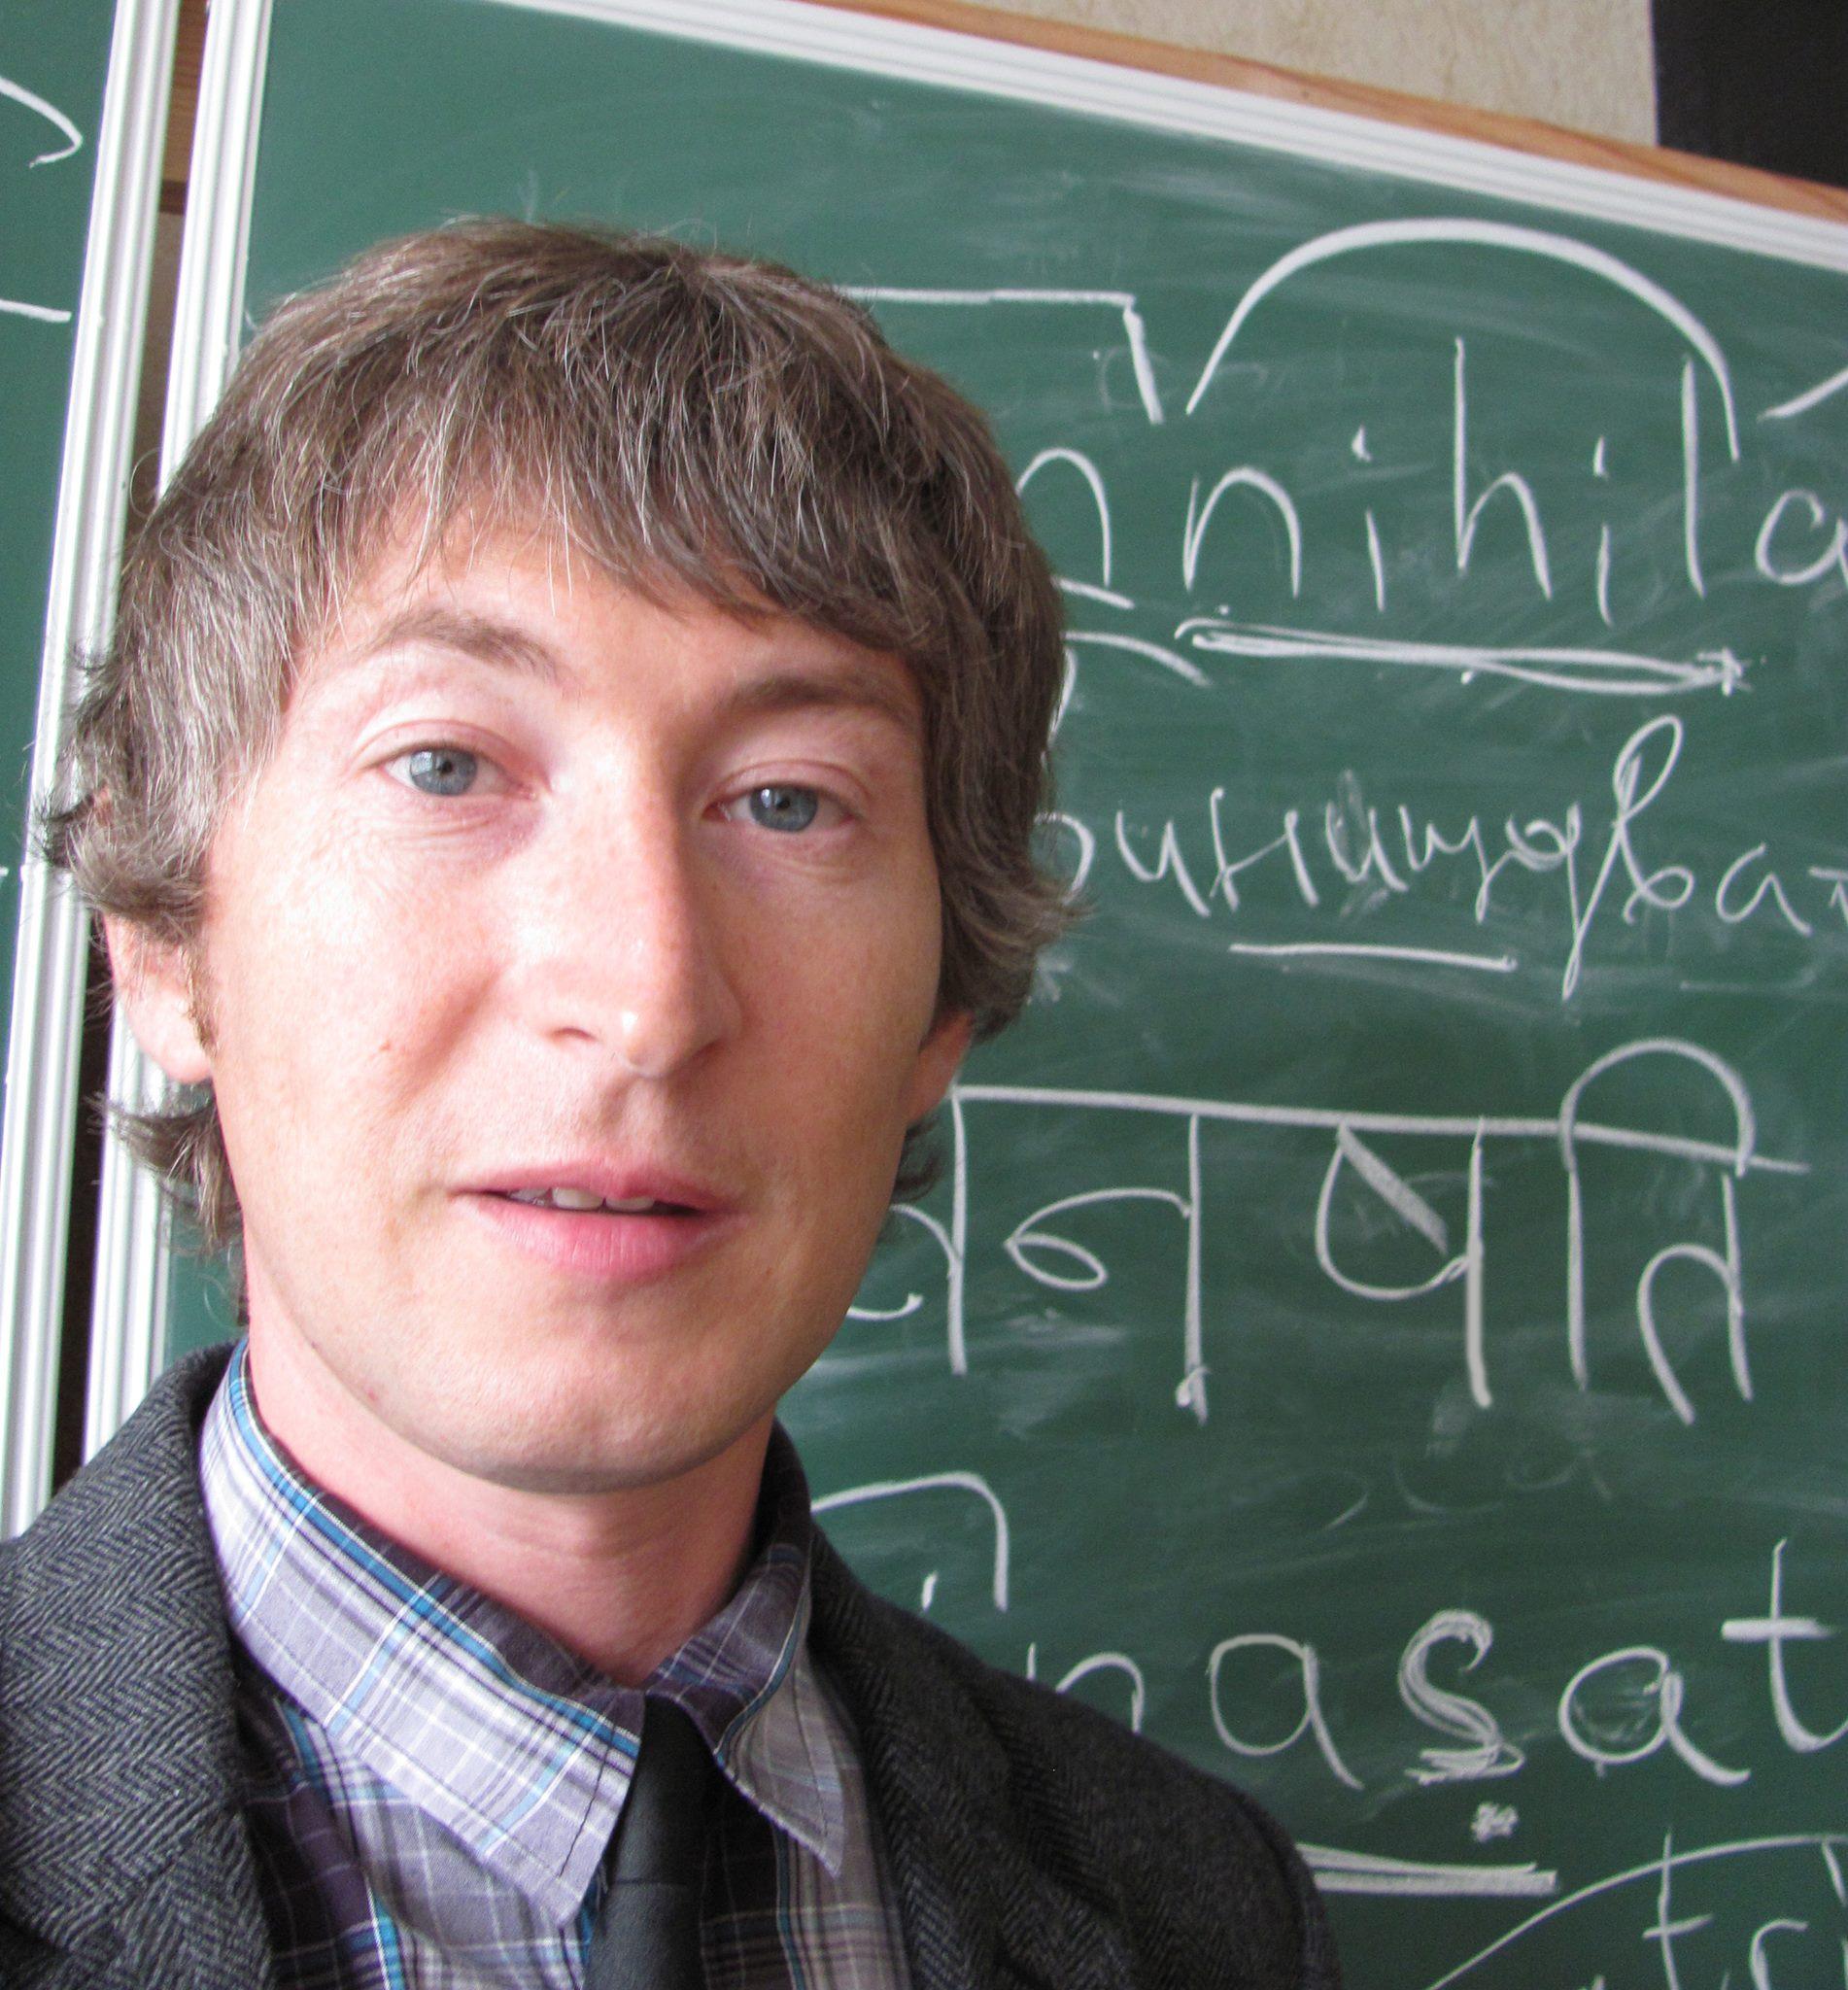 Oleksii Smirnov